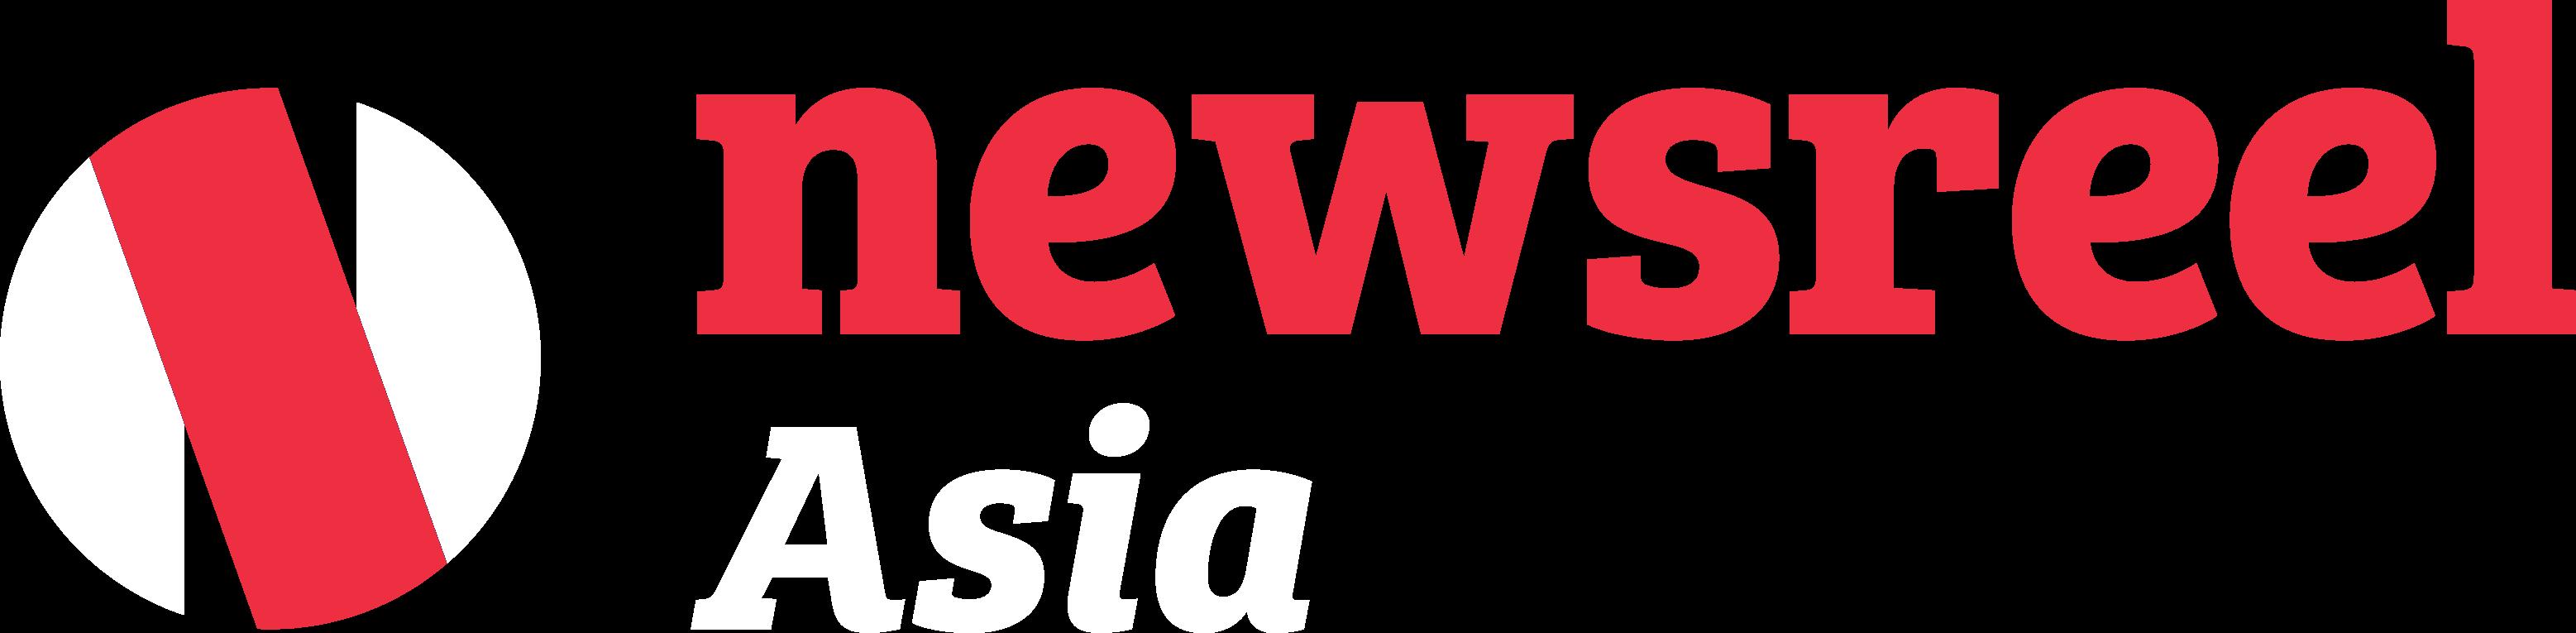 Newsreel Asia